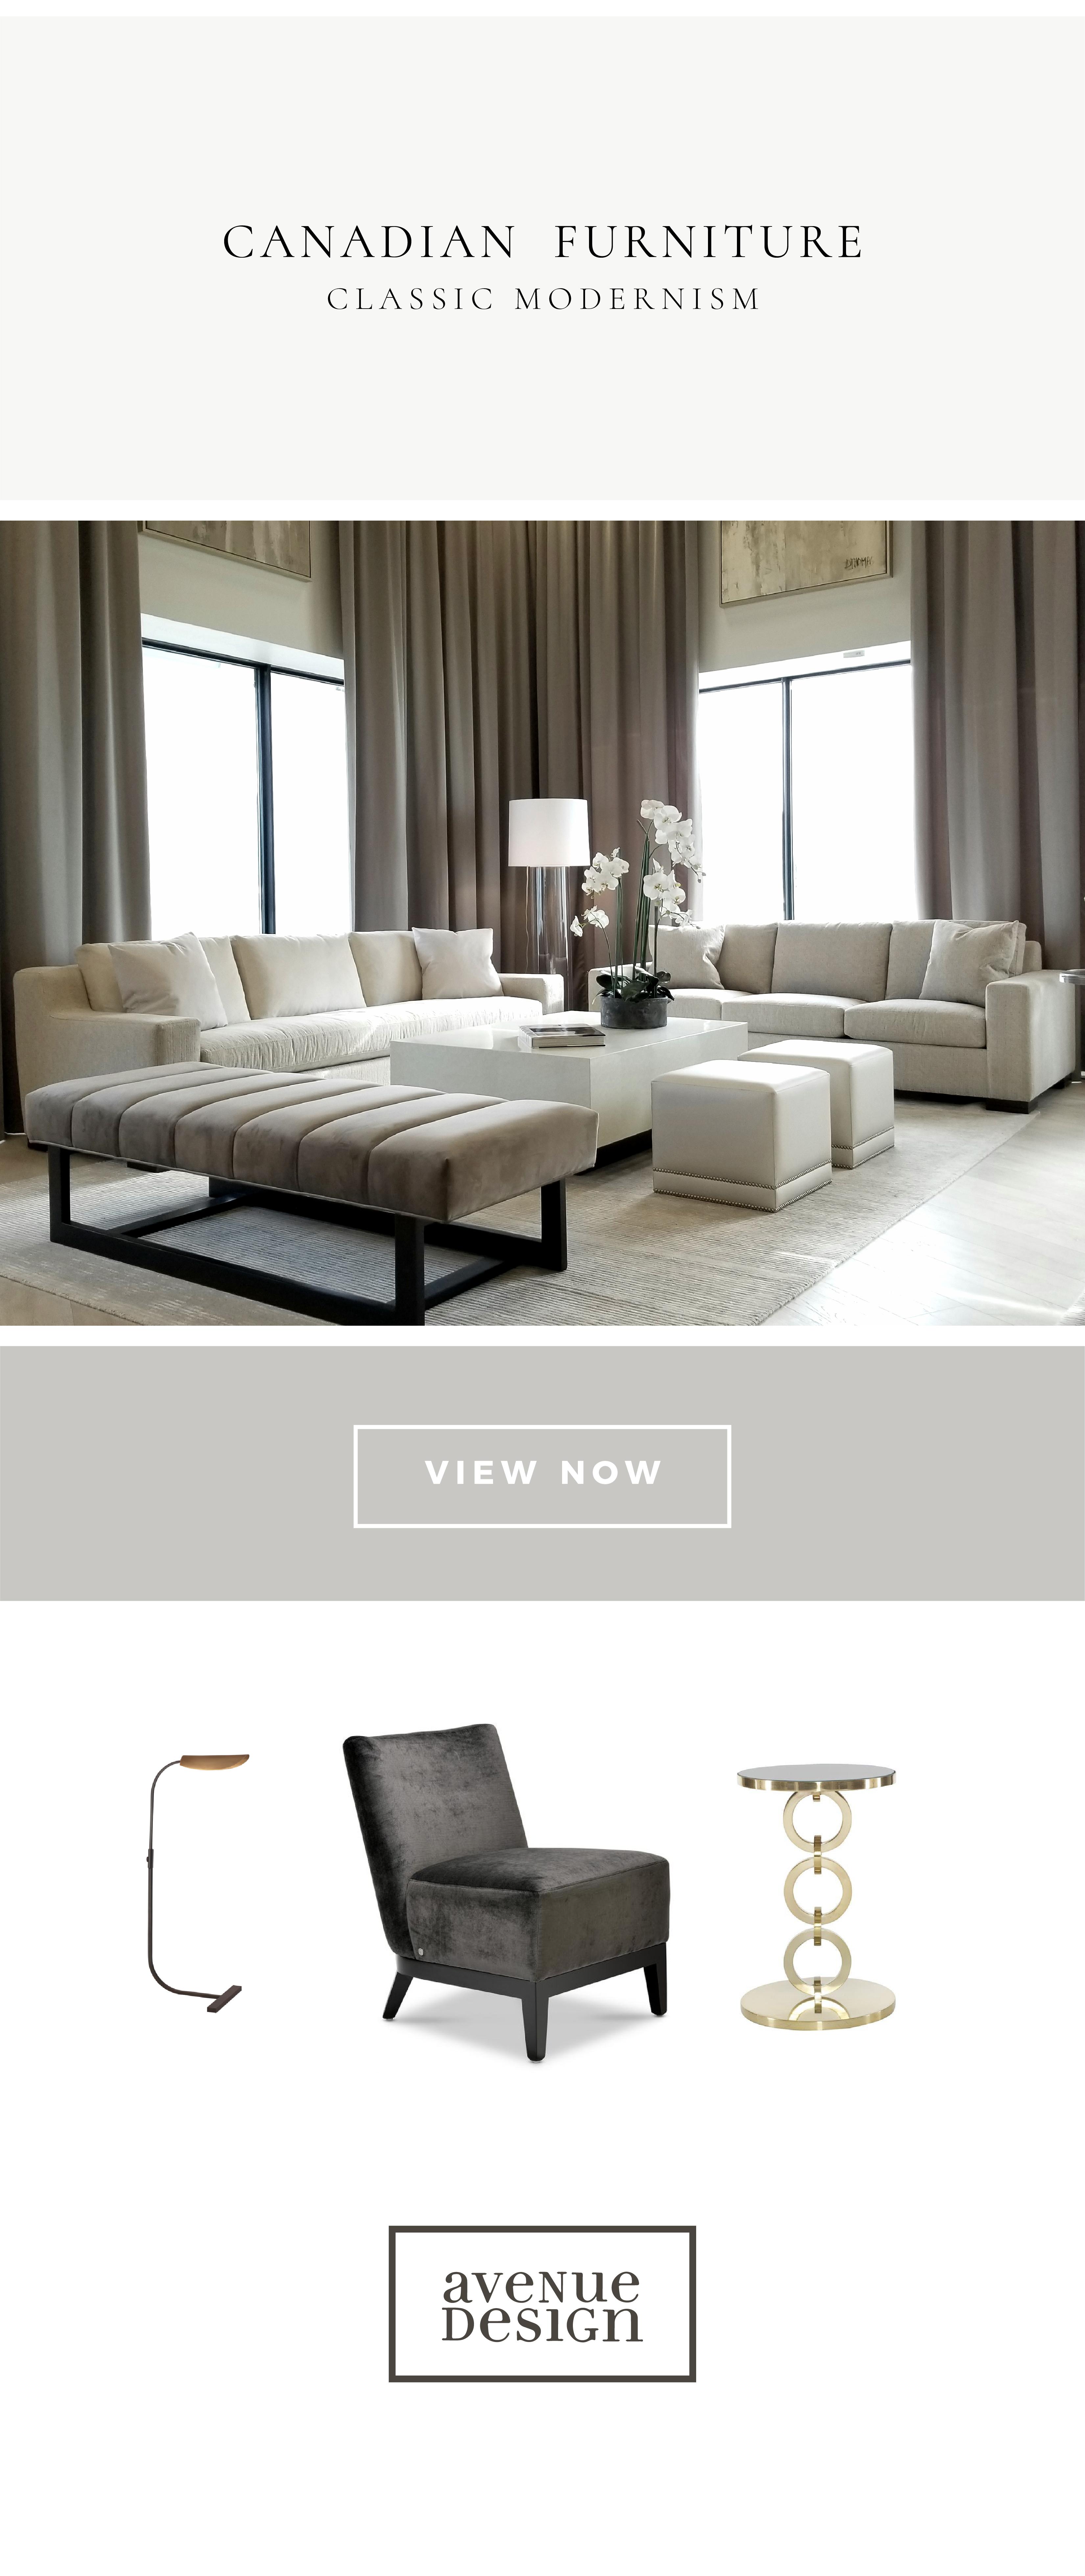 furniture and interior design at montreal based avenue design canada